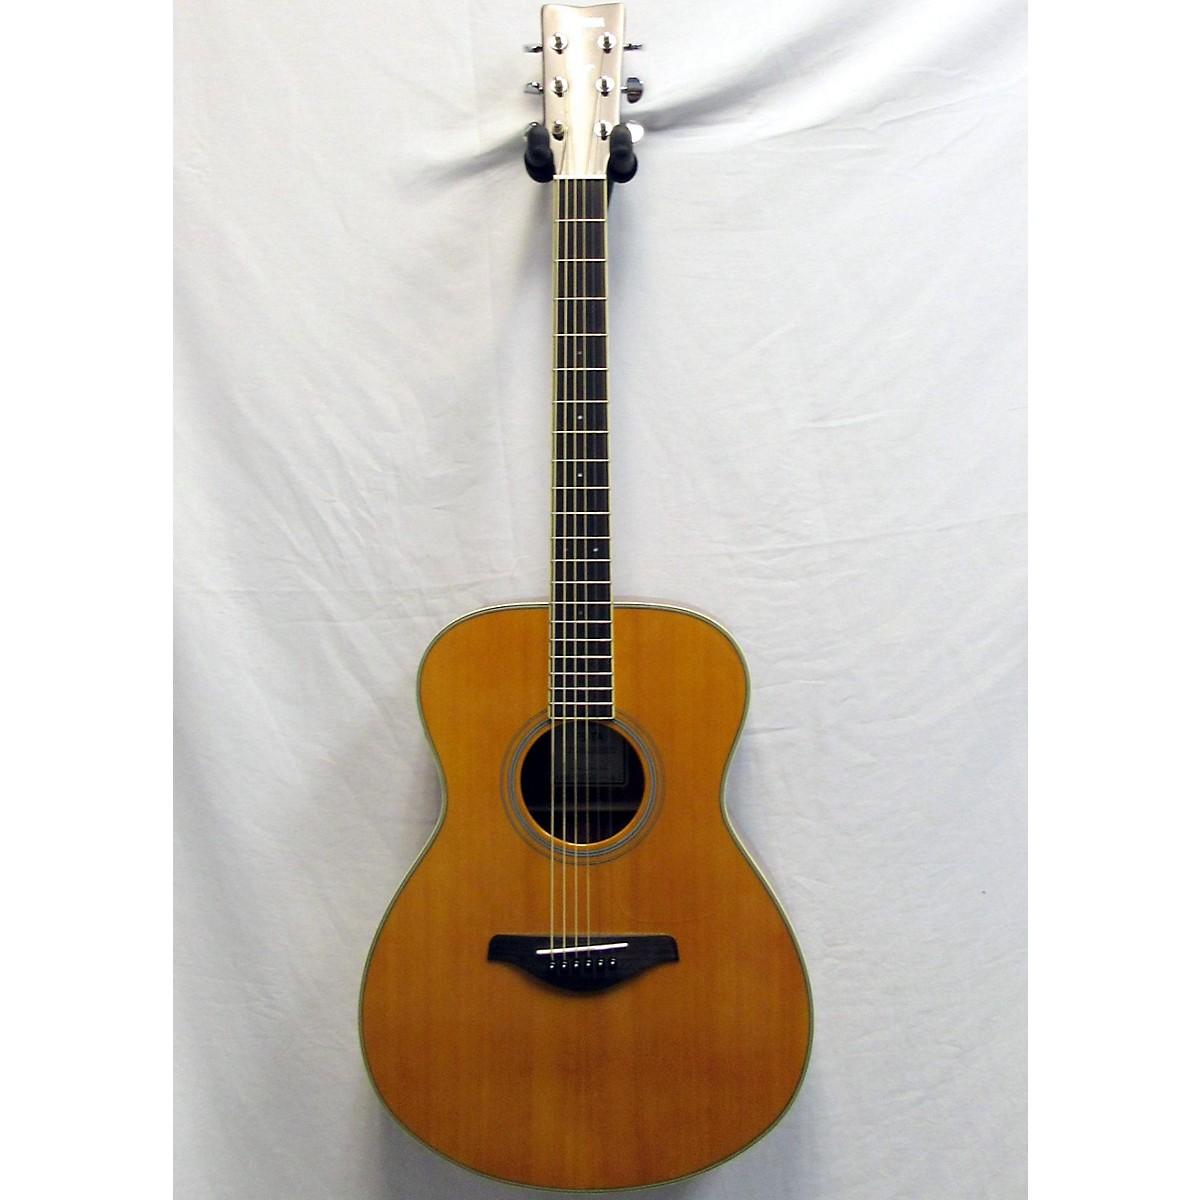 Yamaha FSTA TransAcoustic Concert Acoustic Electric Guitar